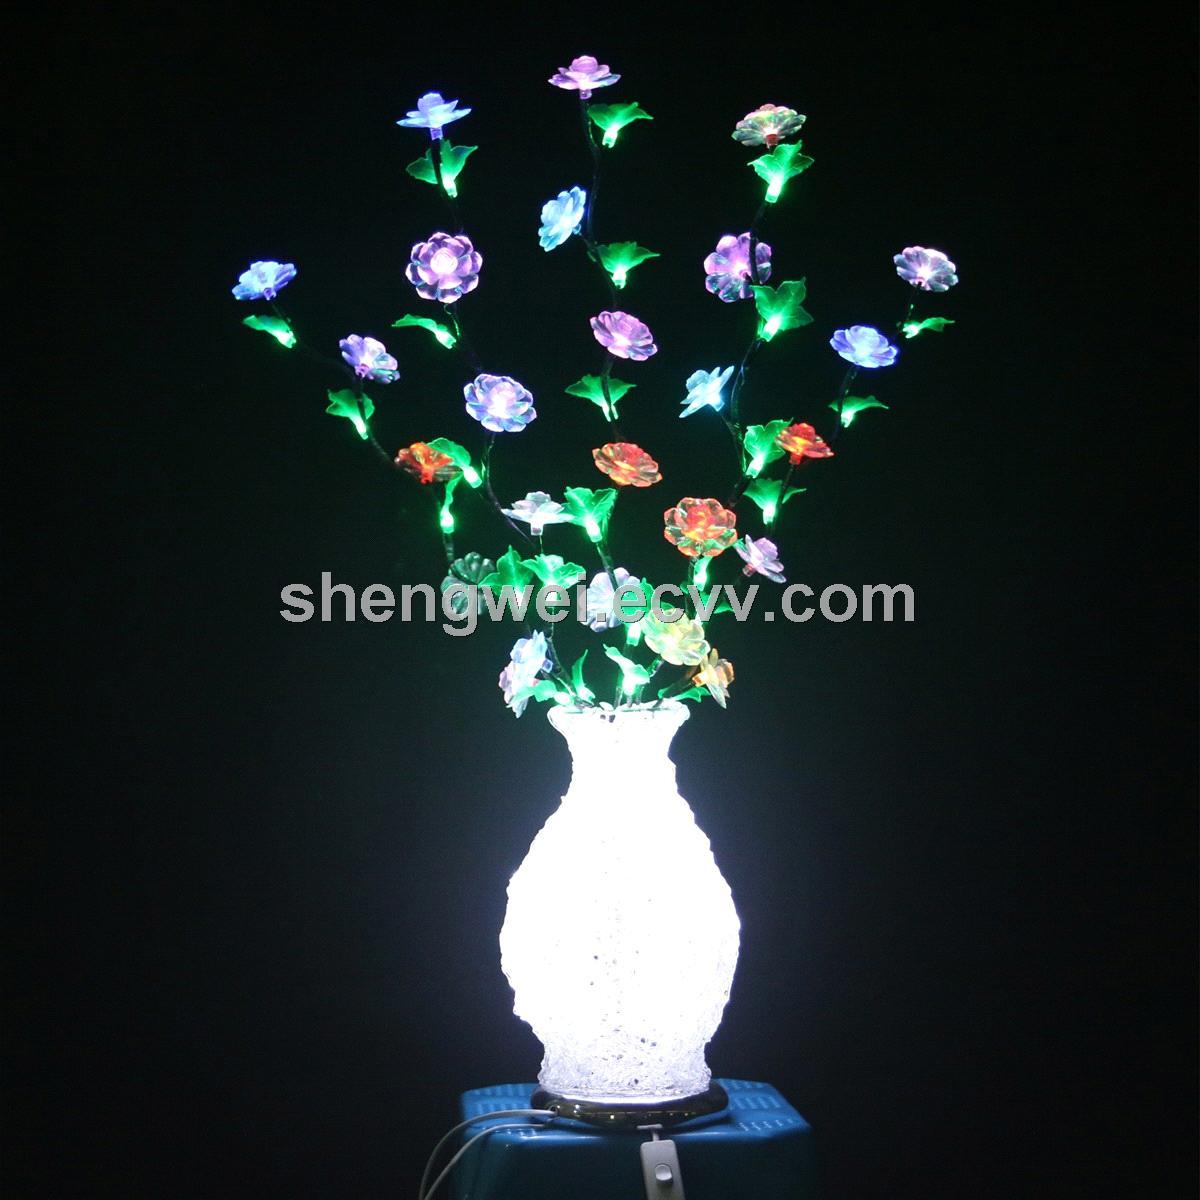 Weddingchristmasnew year flower vase with 108led purchasing ecaltvv reviewsmspy